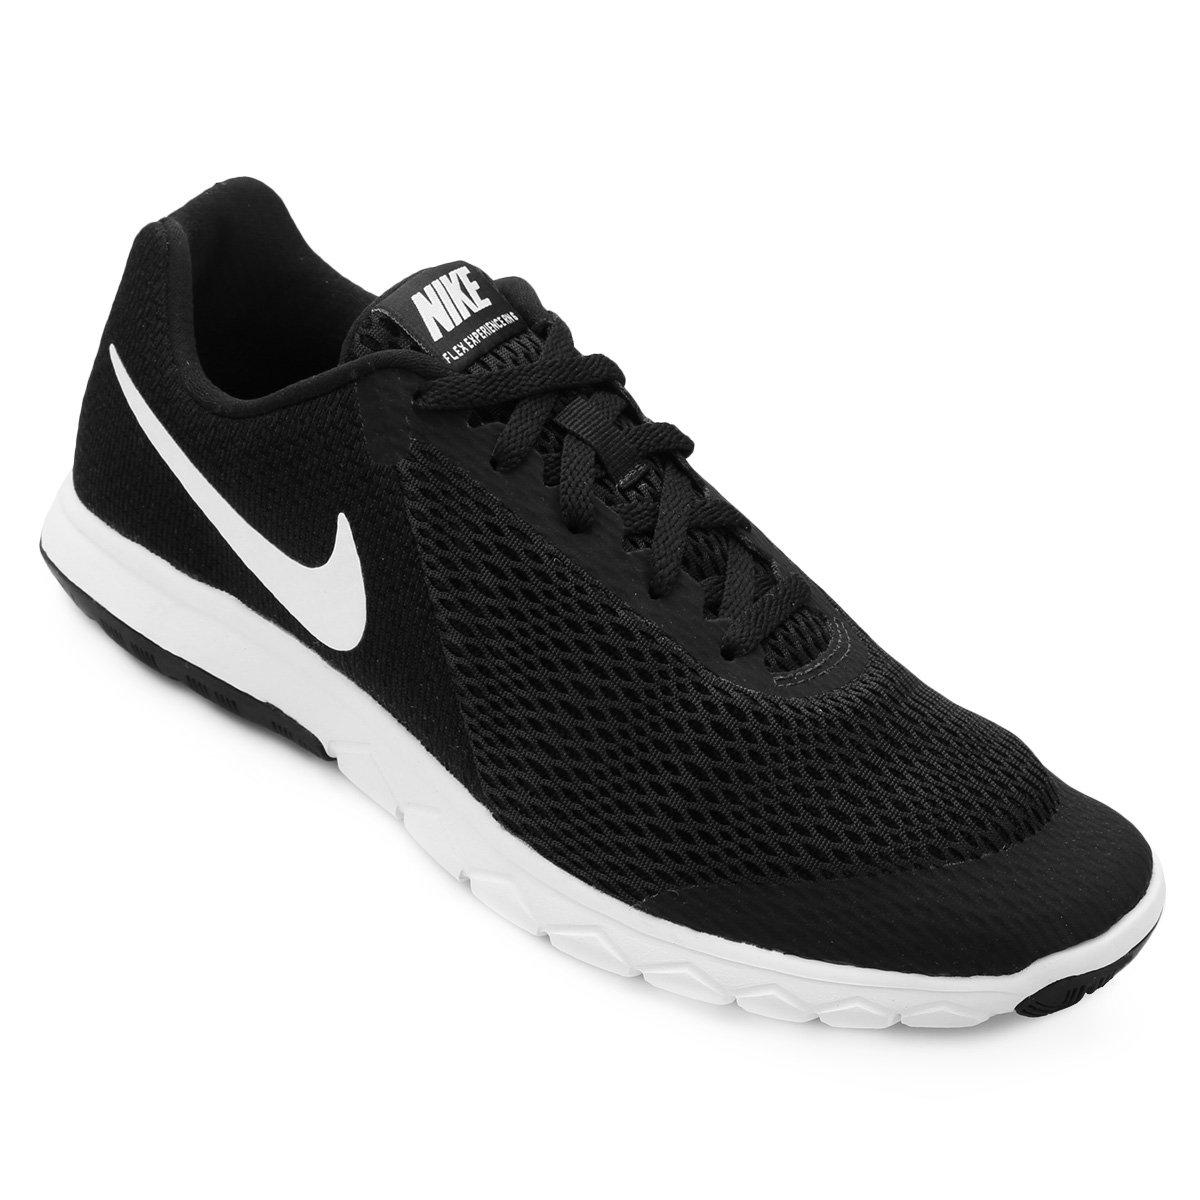 8ef9c9c6c Tênis Nike Flex Experience Rn 6 Feminino | Shop Timão